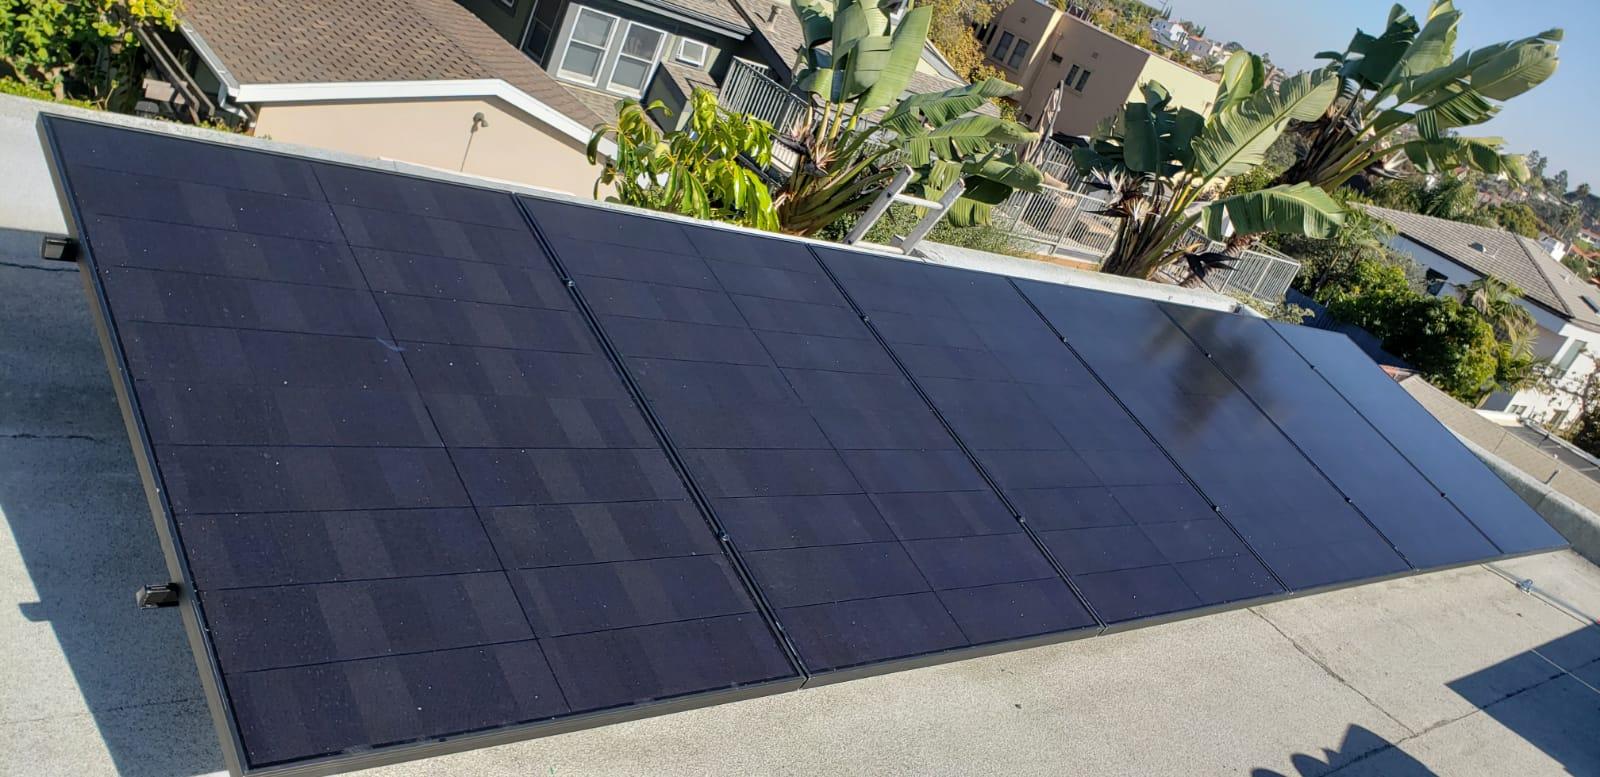 Sunlight Solar System Installation San Diego Image 1